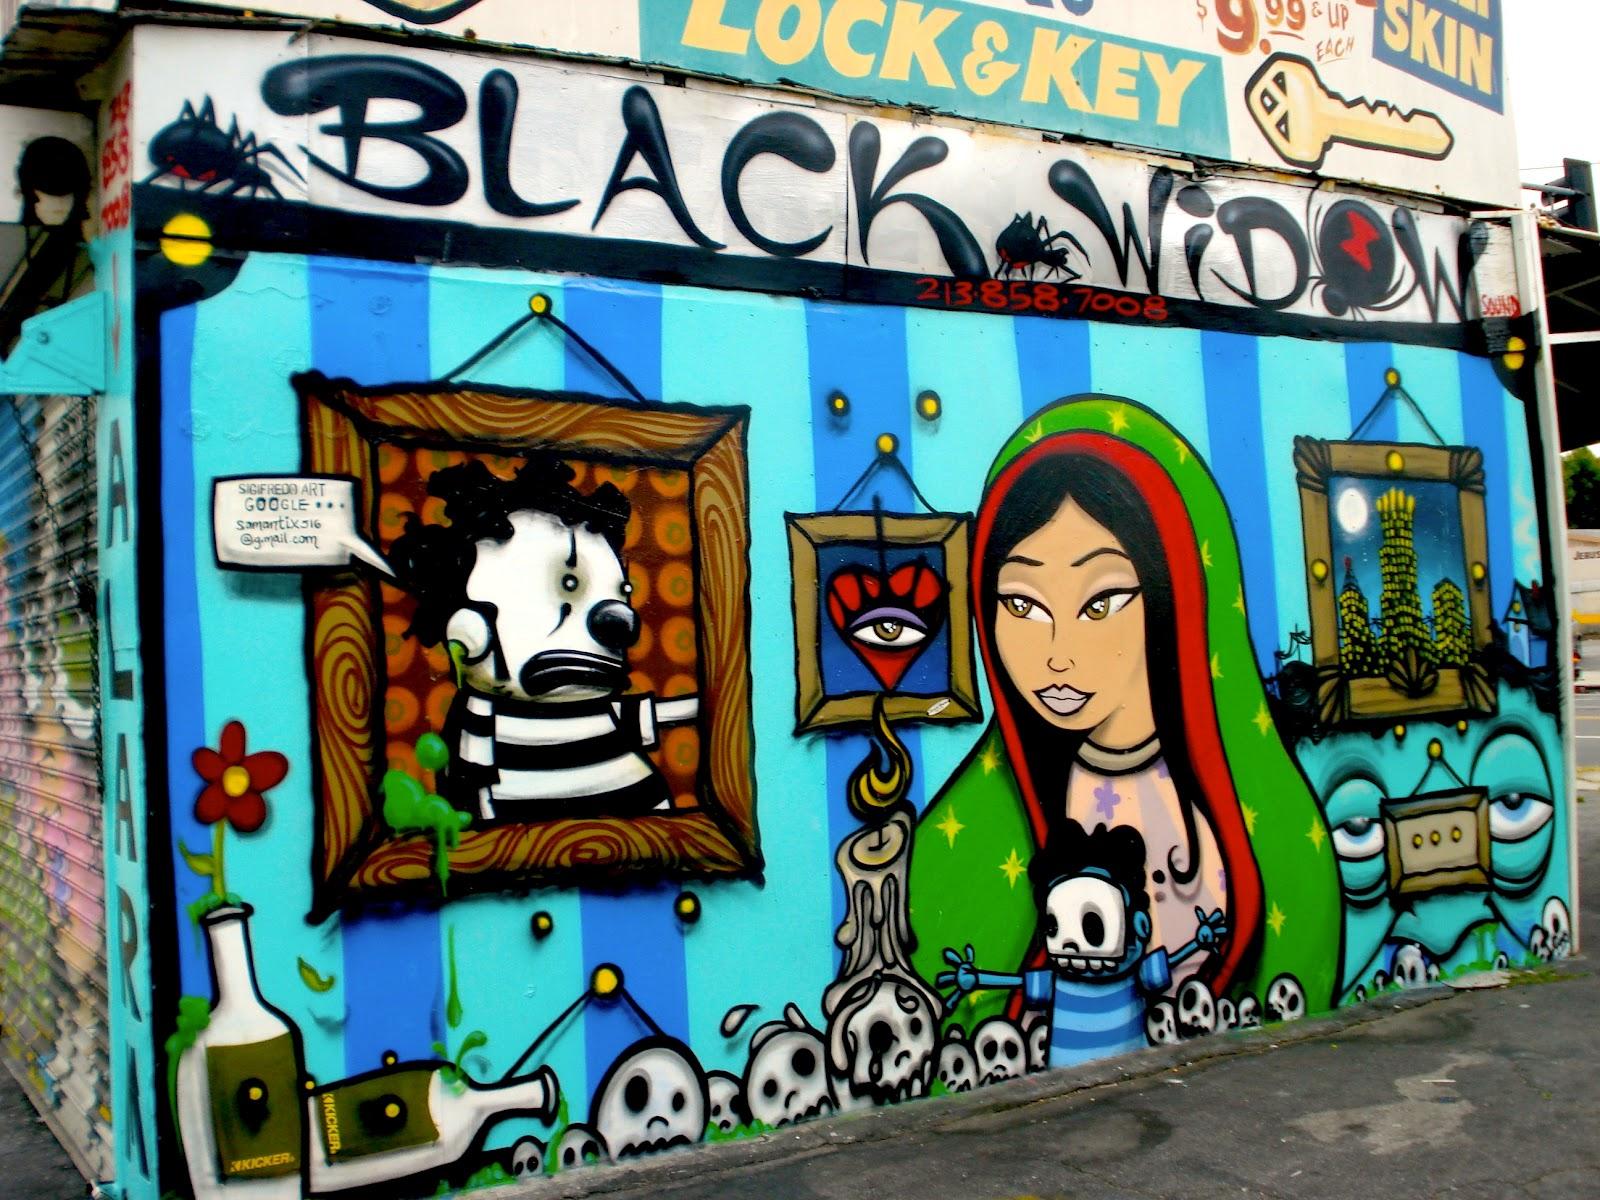 http://4.bp.blogspot.com/-XU_FZ-LK32M/T_xjAUgYIaI/AAAAAAAAAH4/jOfMiP5A2zY/s1600/BlackWidow.JPG